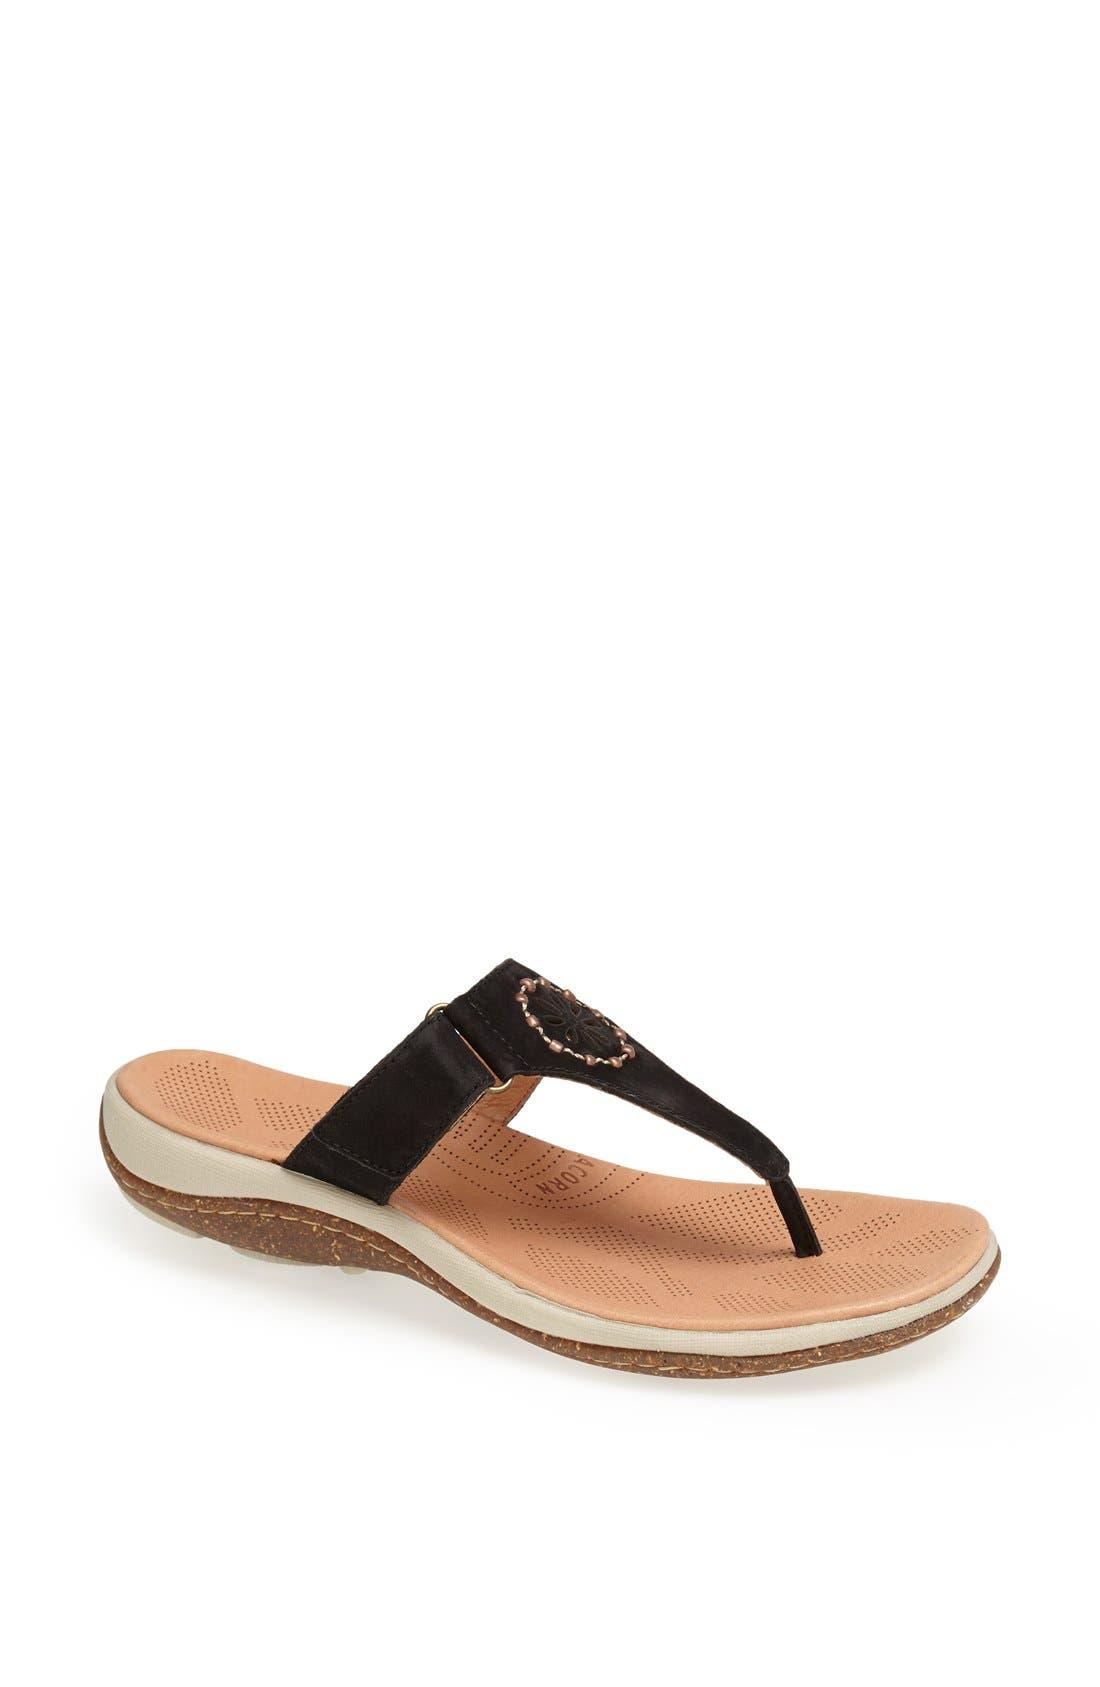 Alternate Image 1 Selected - Acorn 'Vista' Beaded Thong Sandal